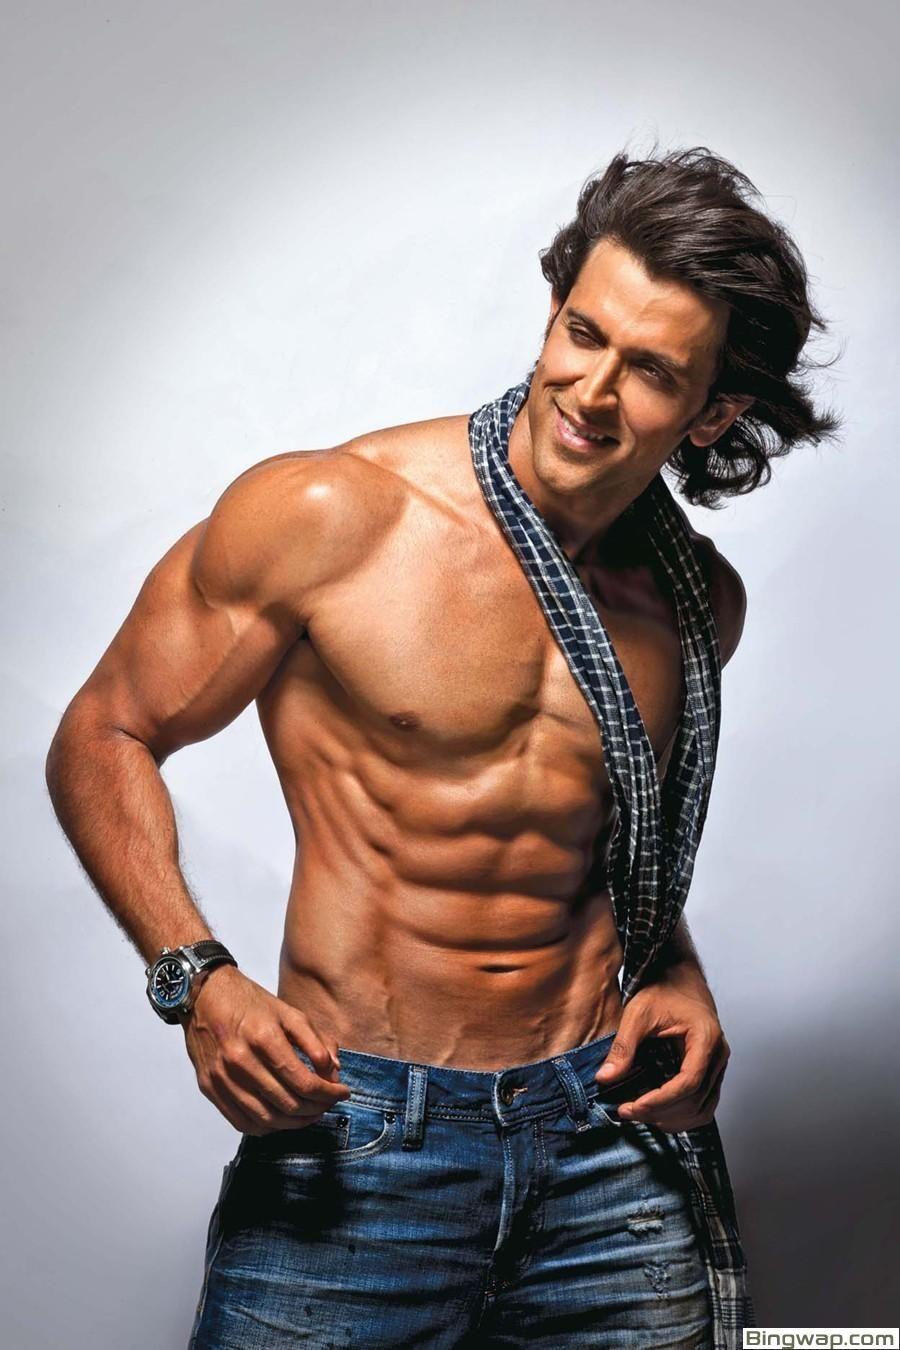 Hritik roshan, sang aktor karismatik versi bollywood